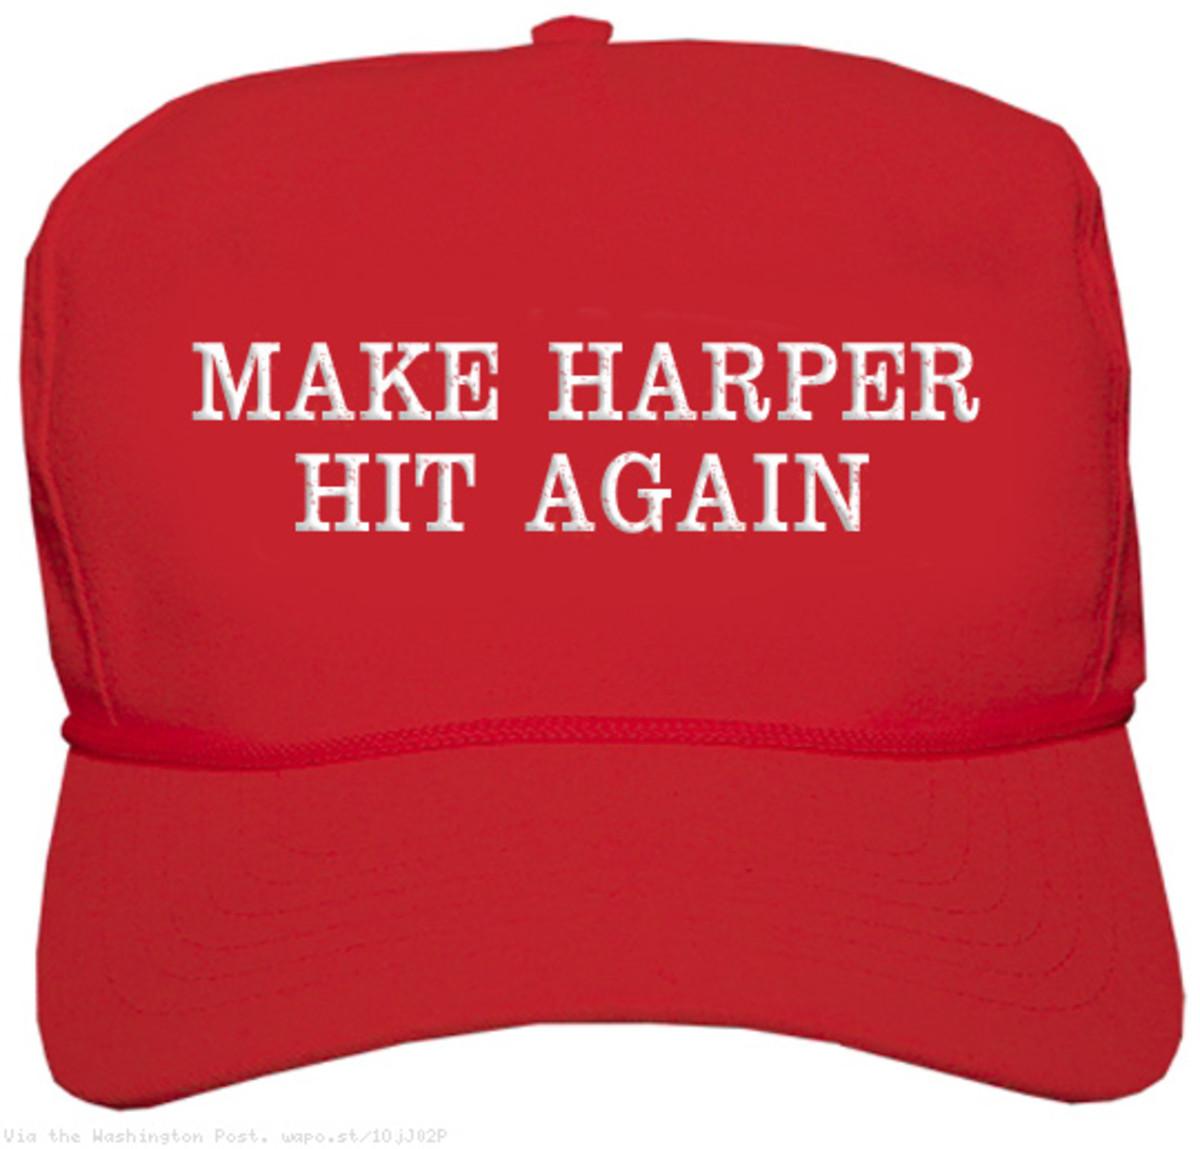 Harper Hat.jpg